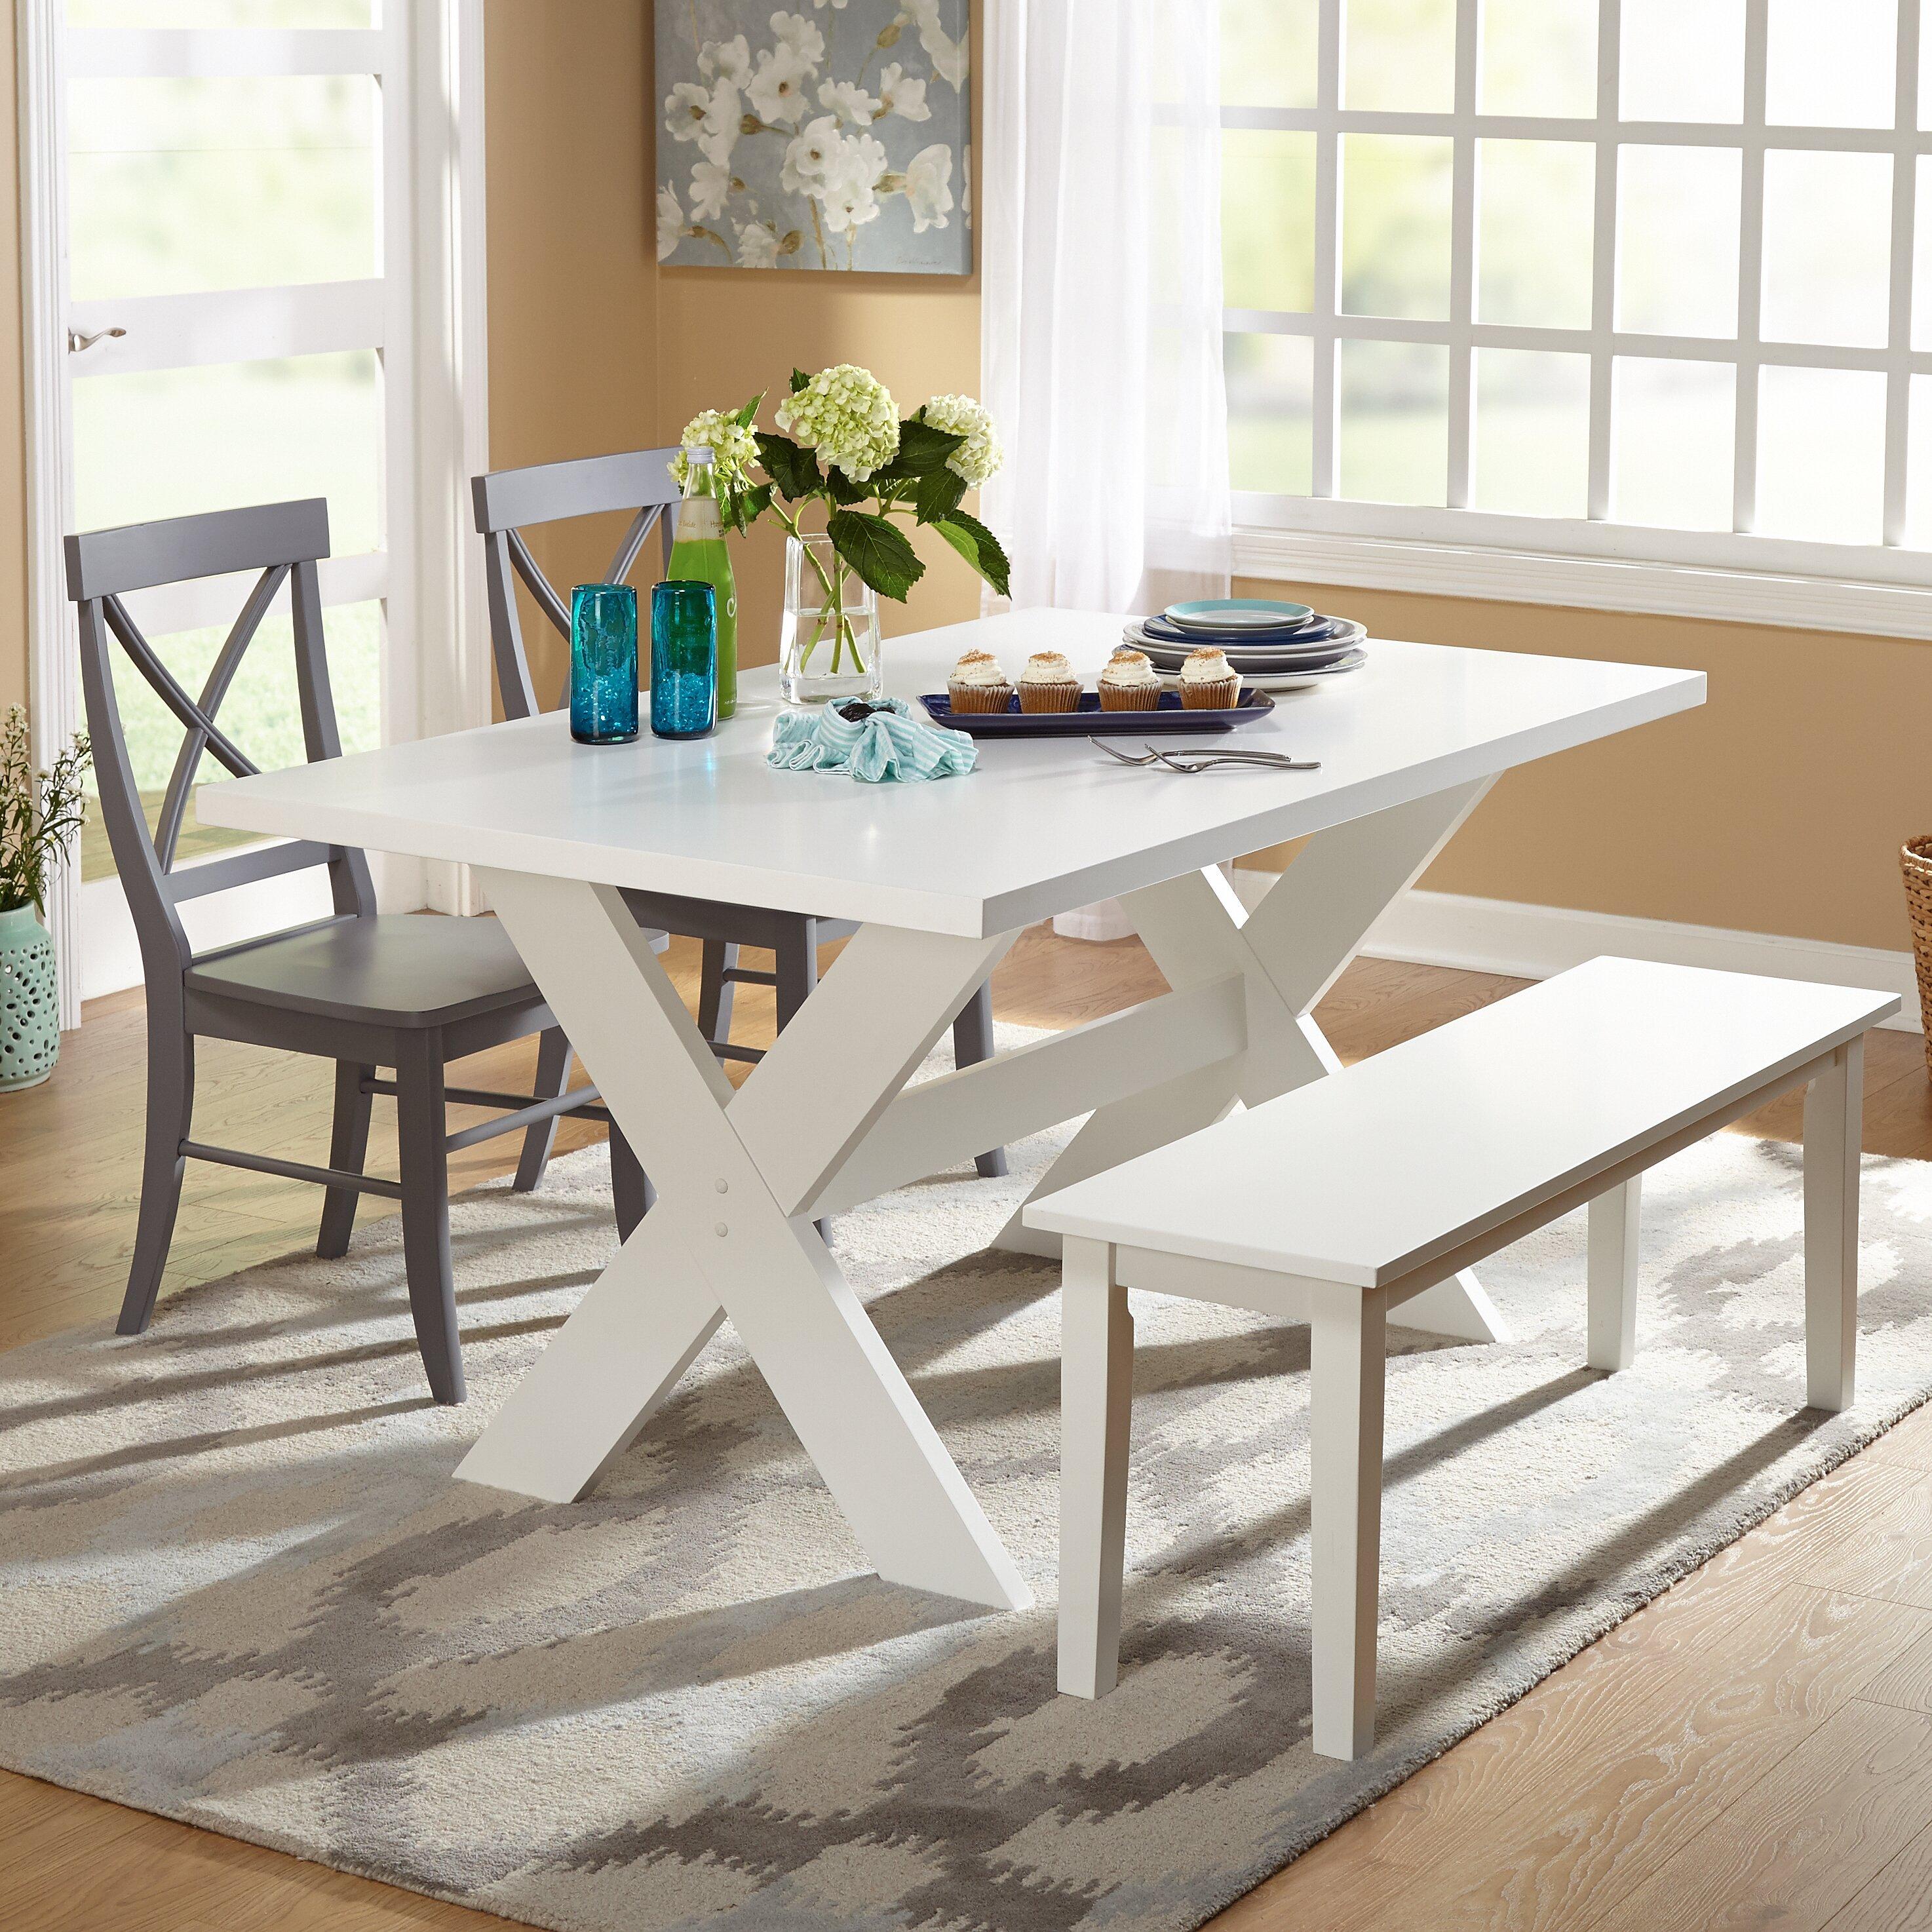 #137180 This Yearu0027s Beachcrest Home Medulla 4 Piece Dining Set U0026 Reviews  Wayfair Four Piece